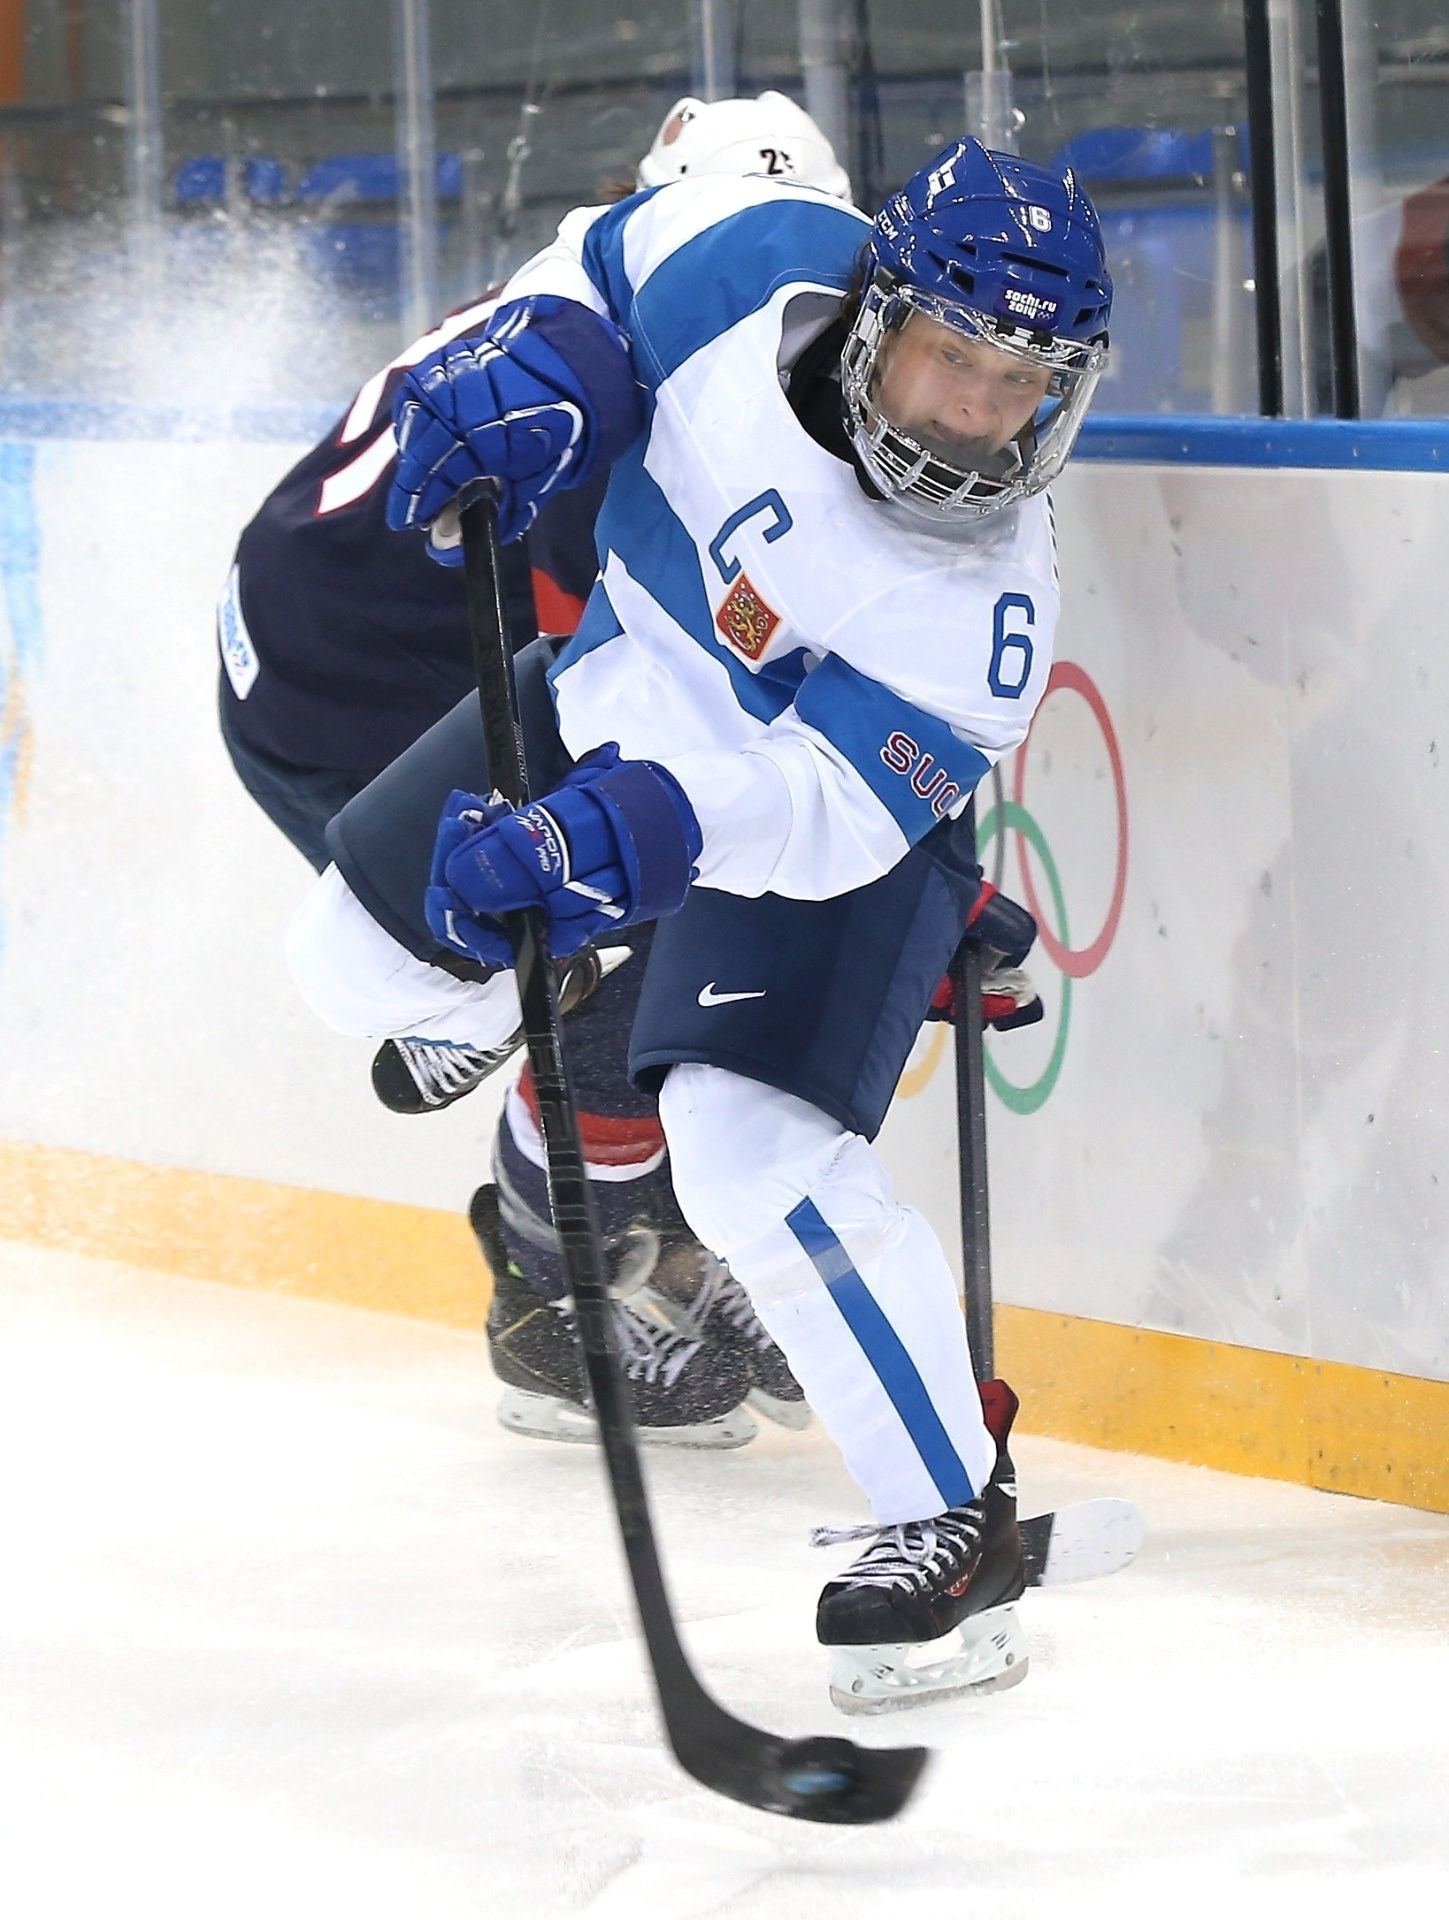 08.02.2014 - Jenni Hiirikoski, da Finlândia, empurra Hilary Knight para trás